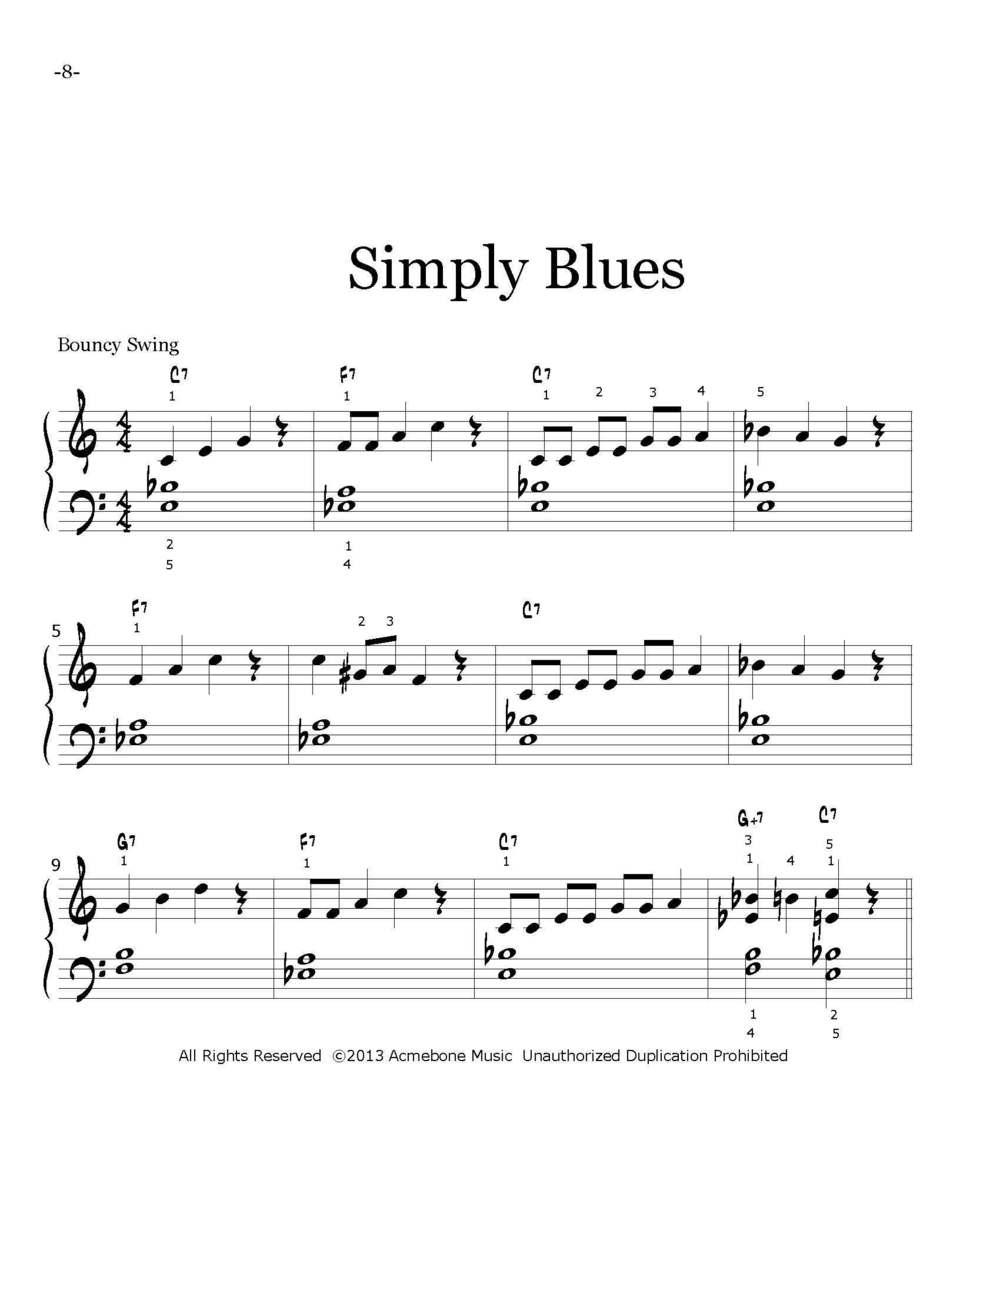 Progressive Jazz Etudes for Piano Bk1 page — :acmebone